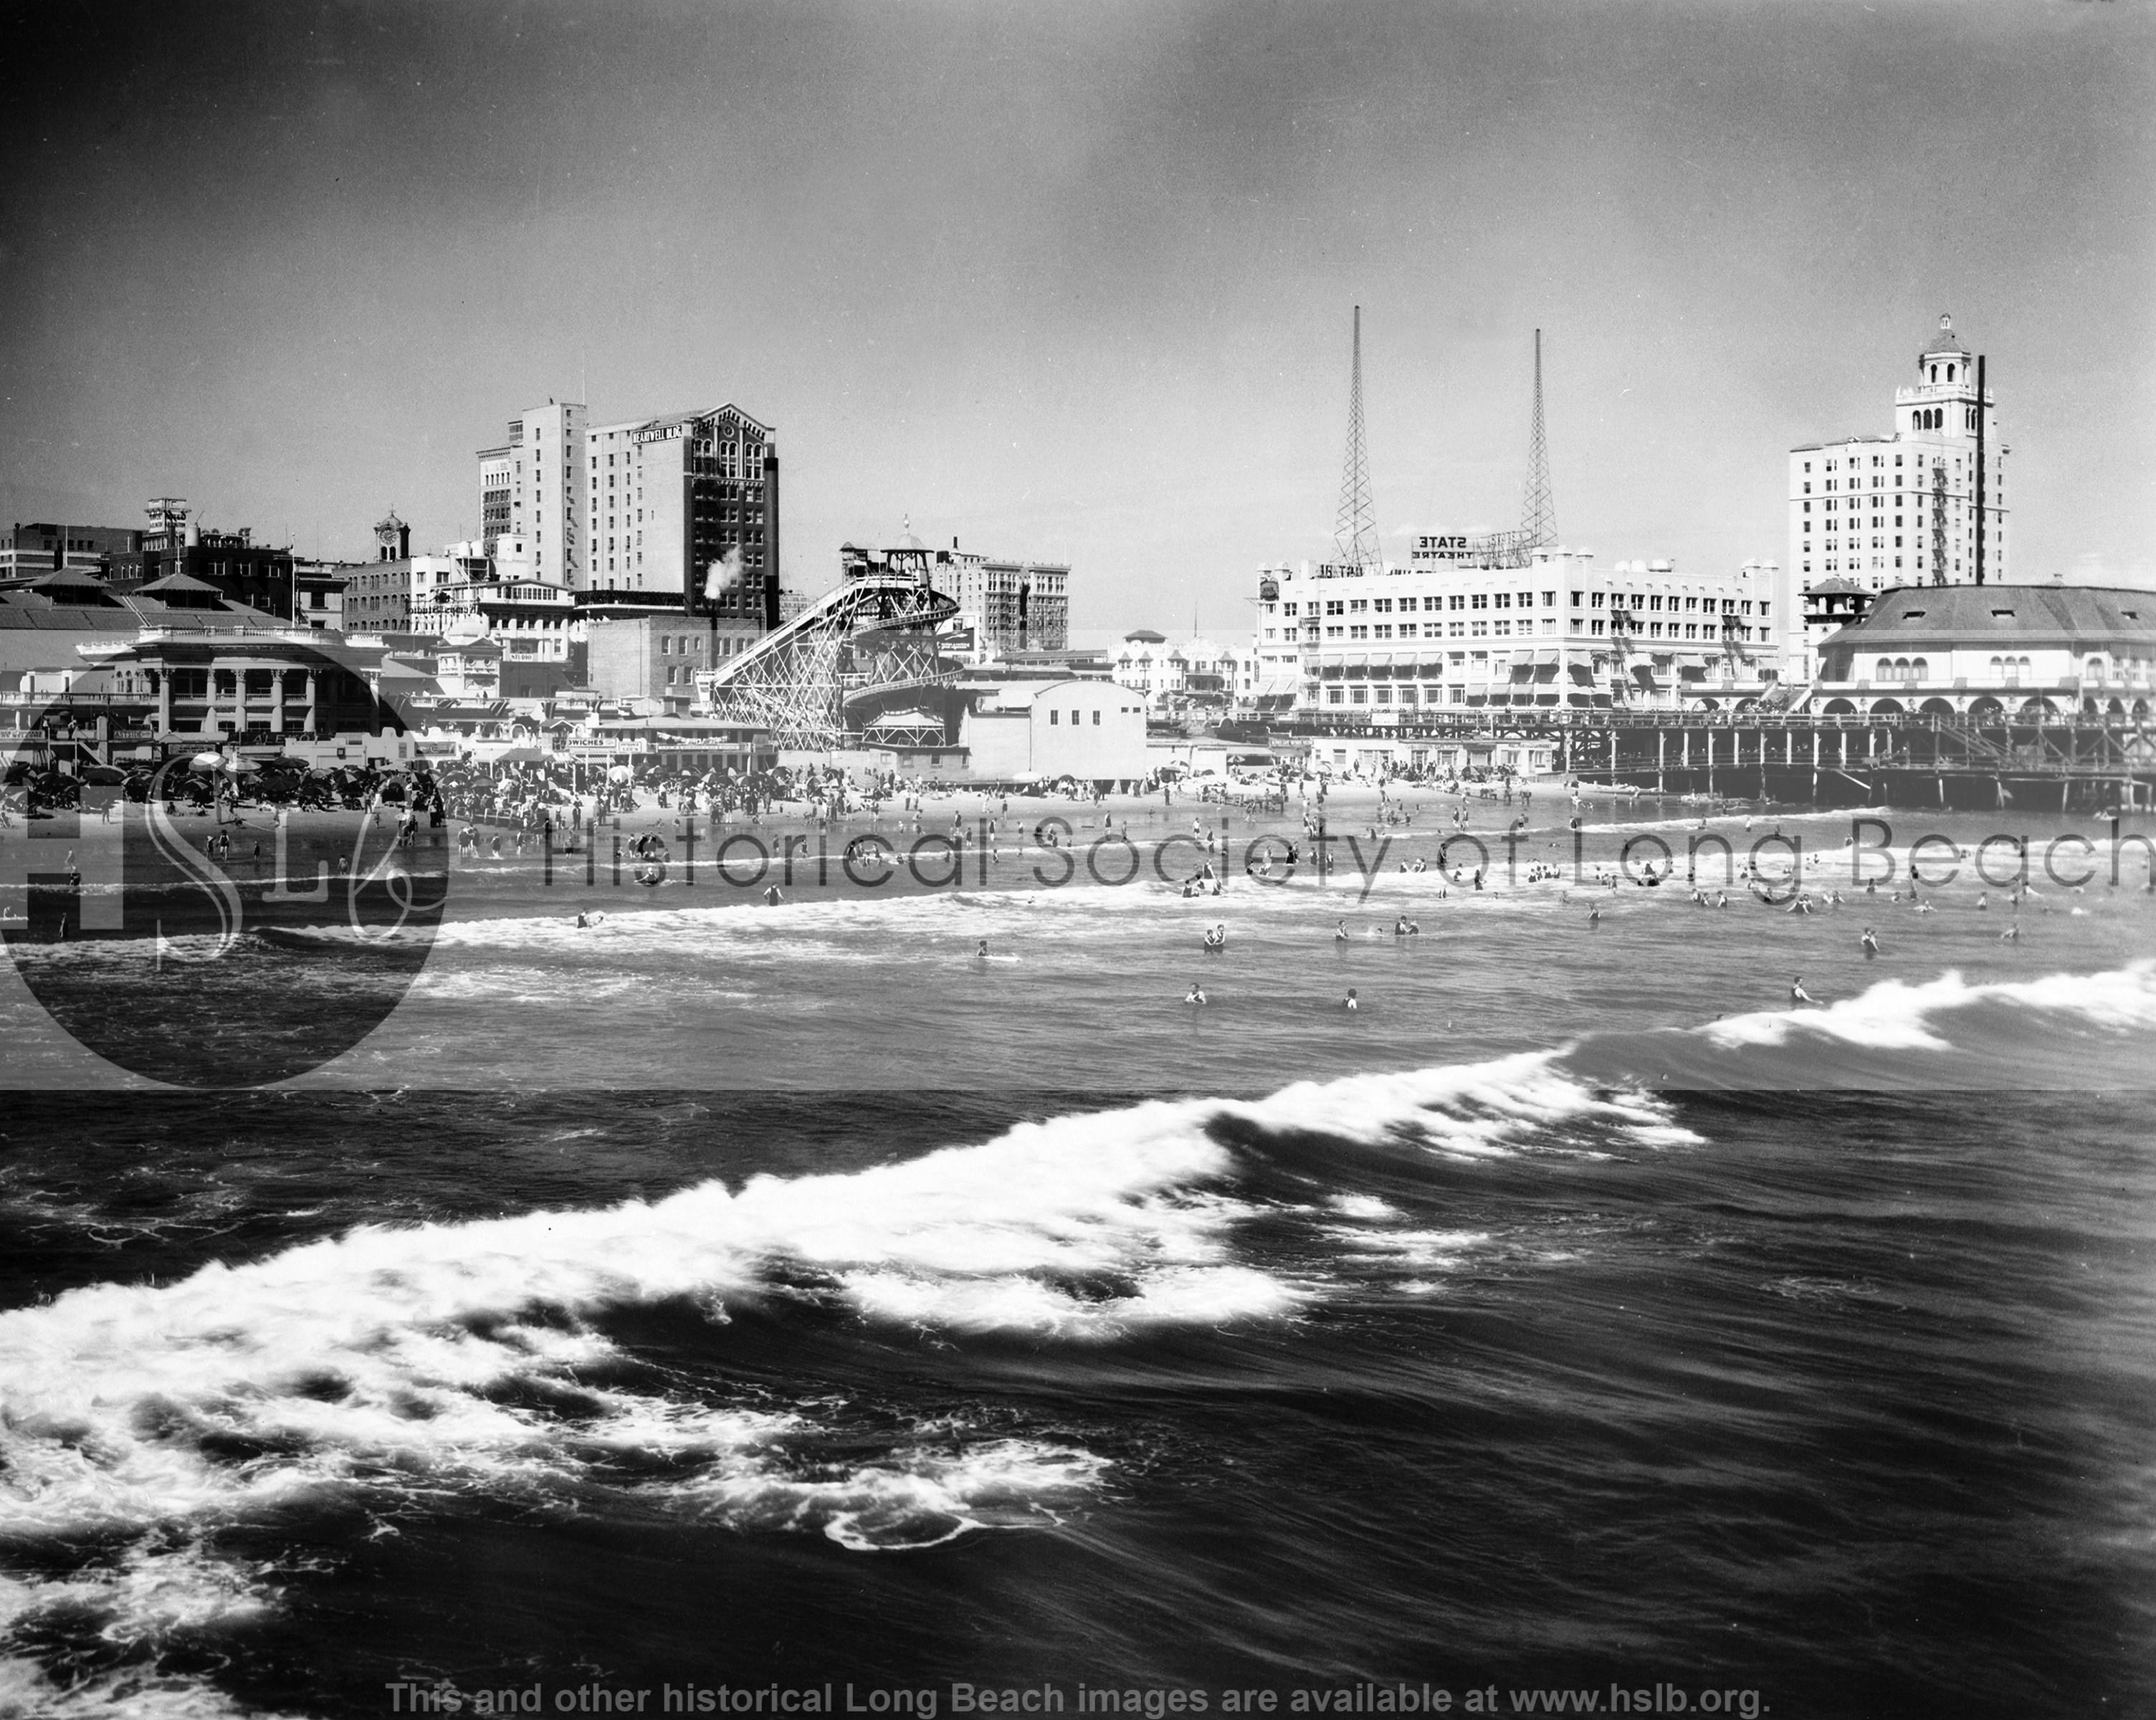 Beach w Pike, 1926 vintage photograph